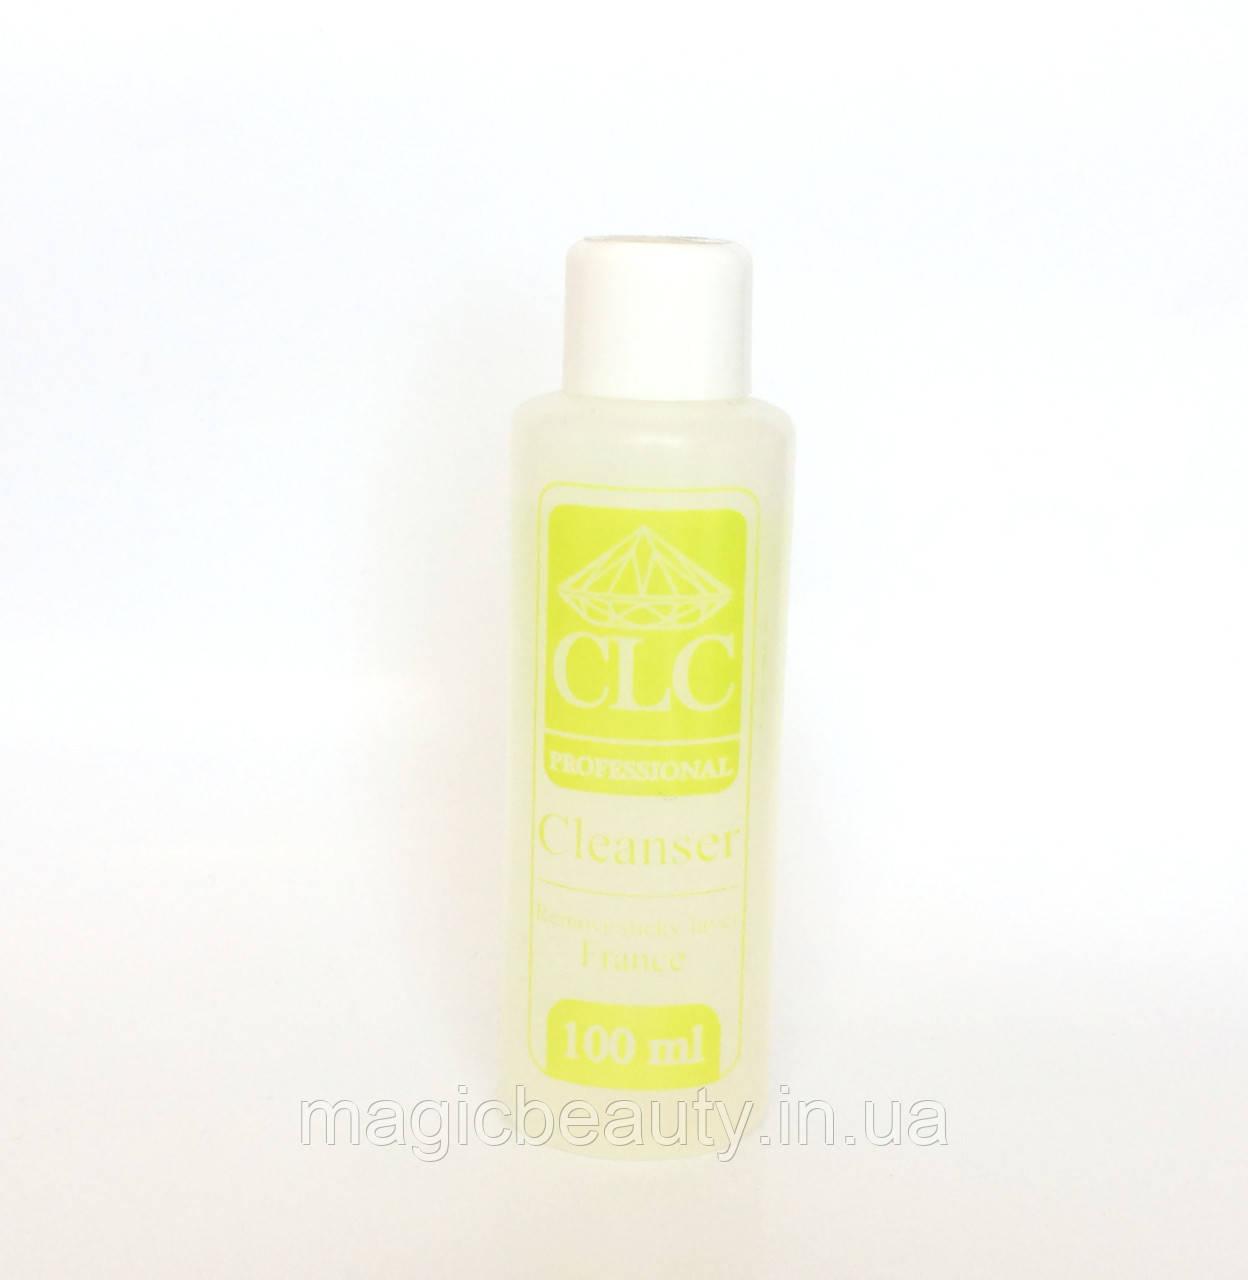 Жидкость для снятия липкого слоя CLC PRO Cleanser 100ml (Ананас)